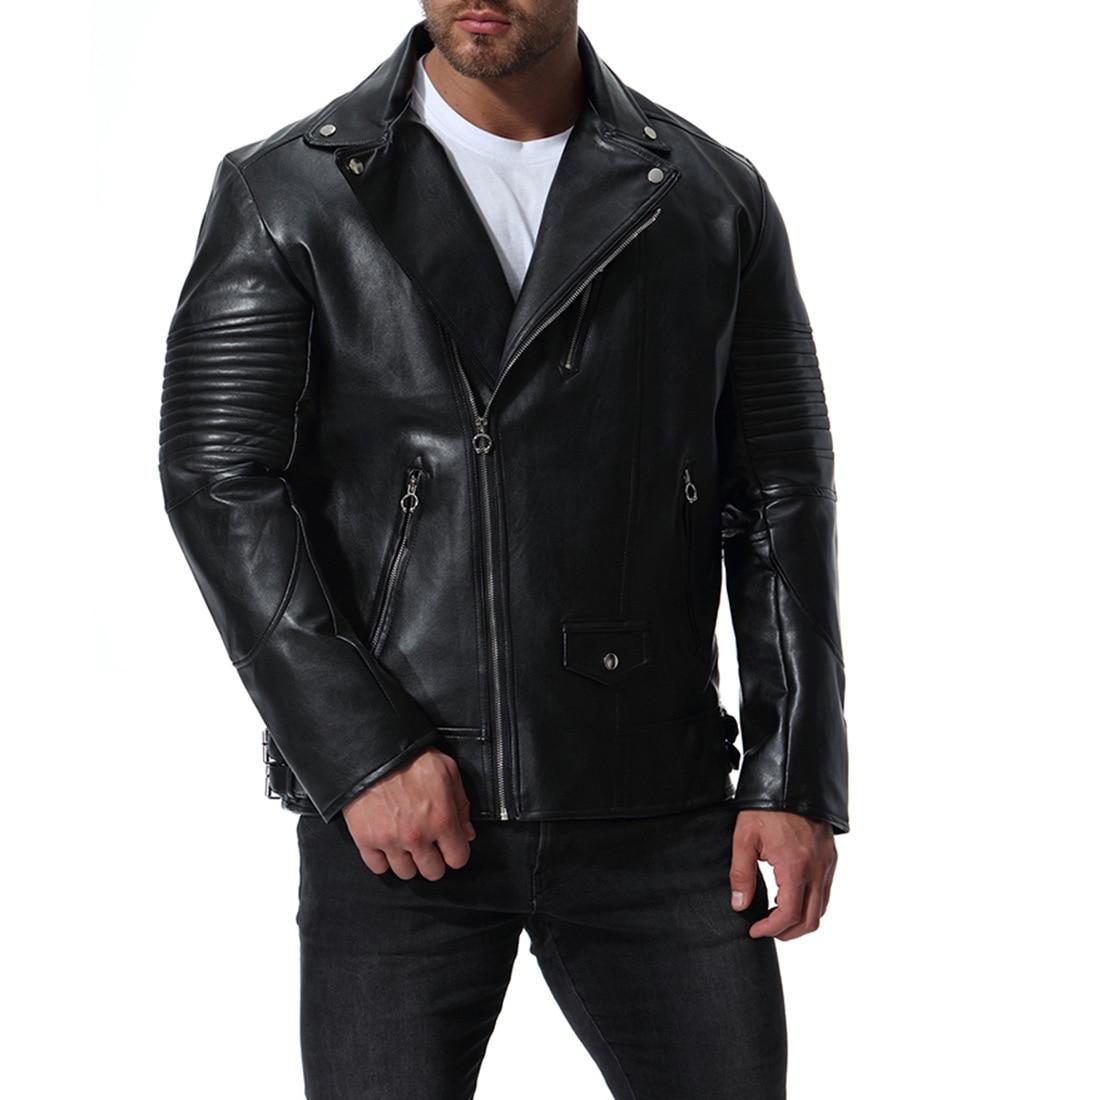 2019 Fall and Winter Newest M-5xl Large Size Locomotive Pu Leather Black Color Suit Men's Leather Jacket Coat Jaket Men